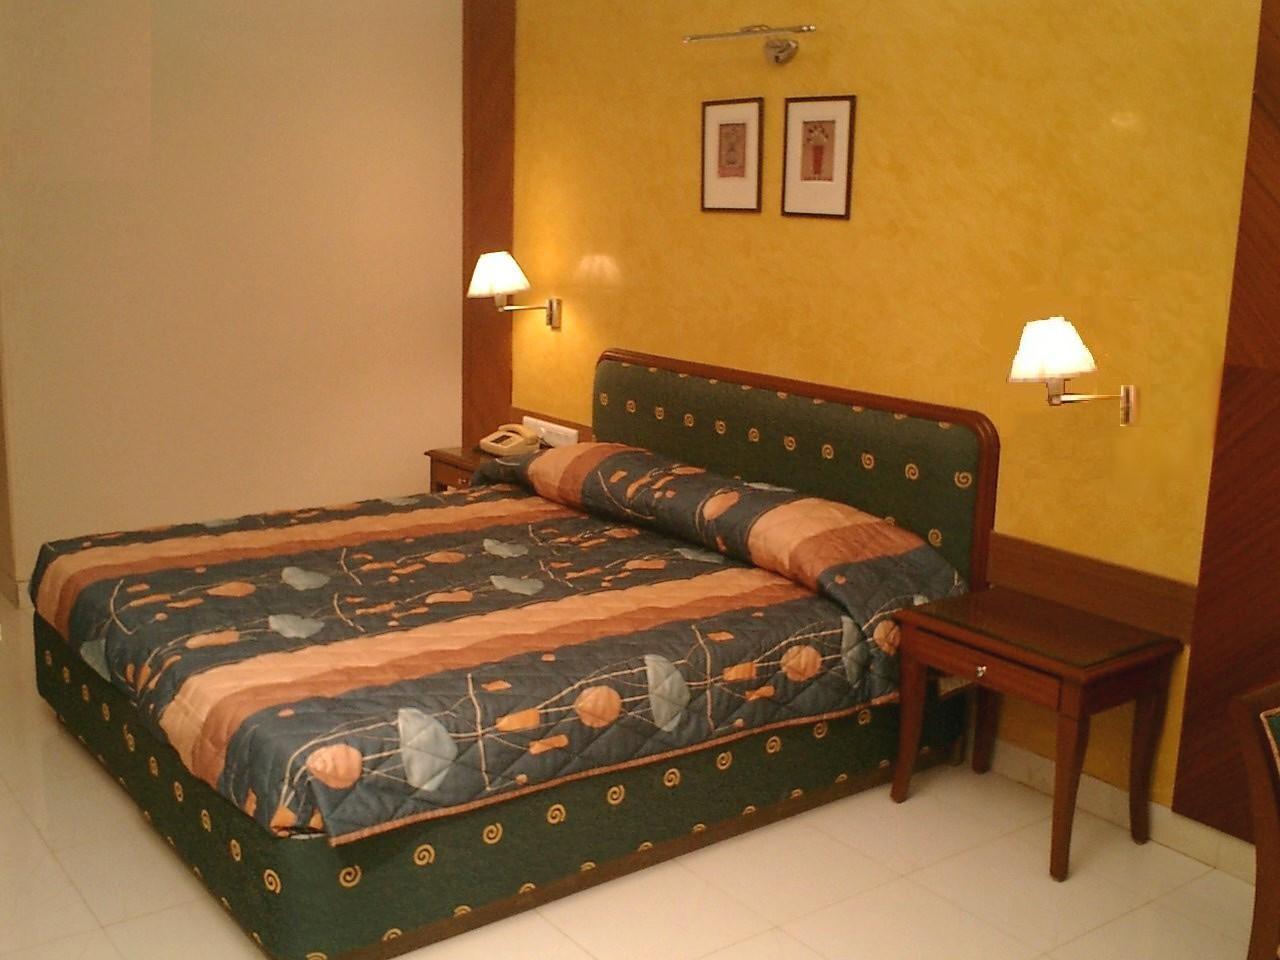 FIDALGO HOTEL